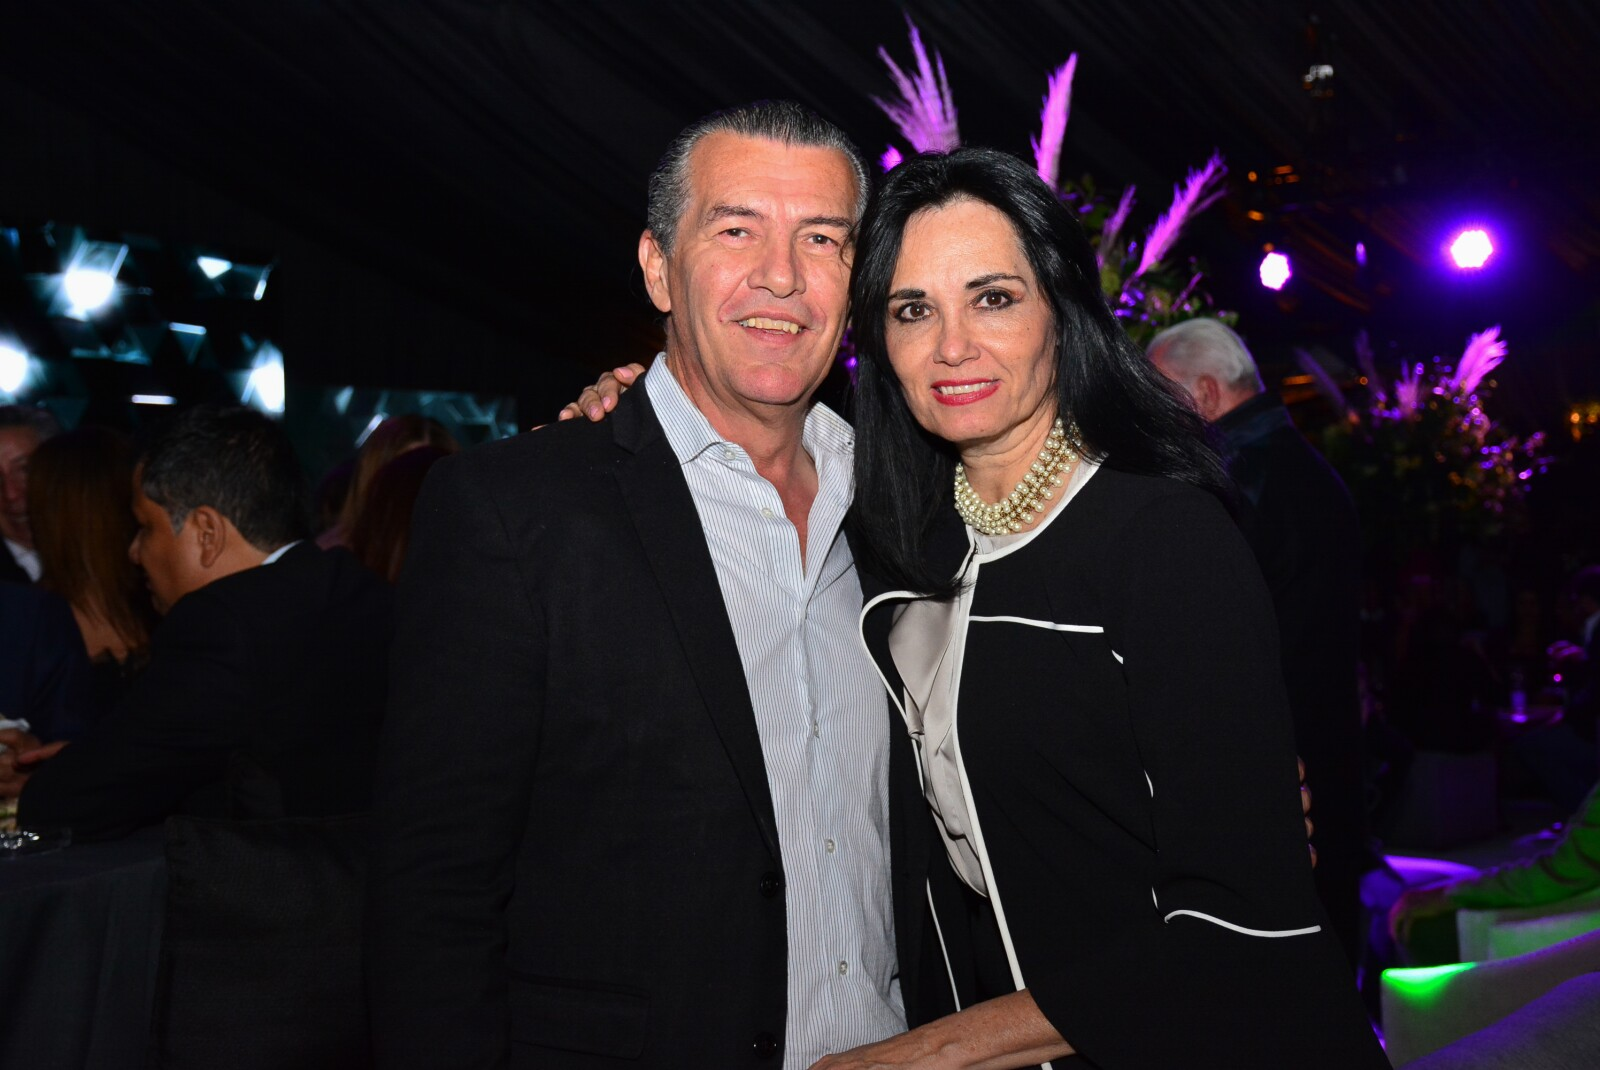 Jorge de Alba Rulfo y Lorena Hecht.jpg